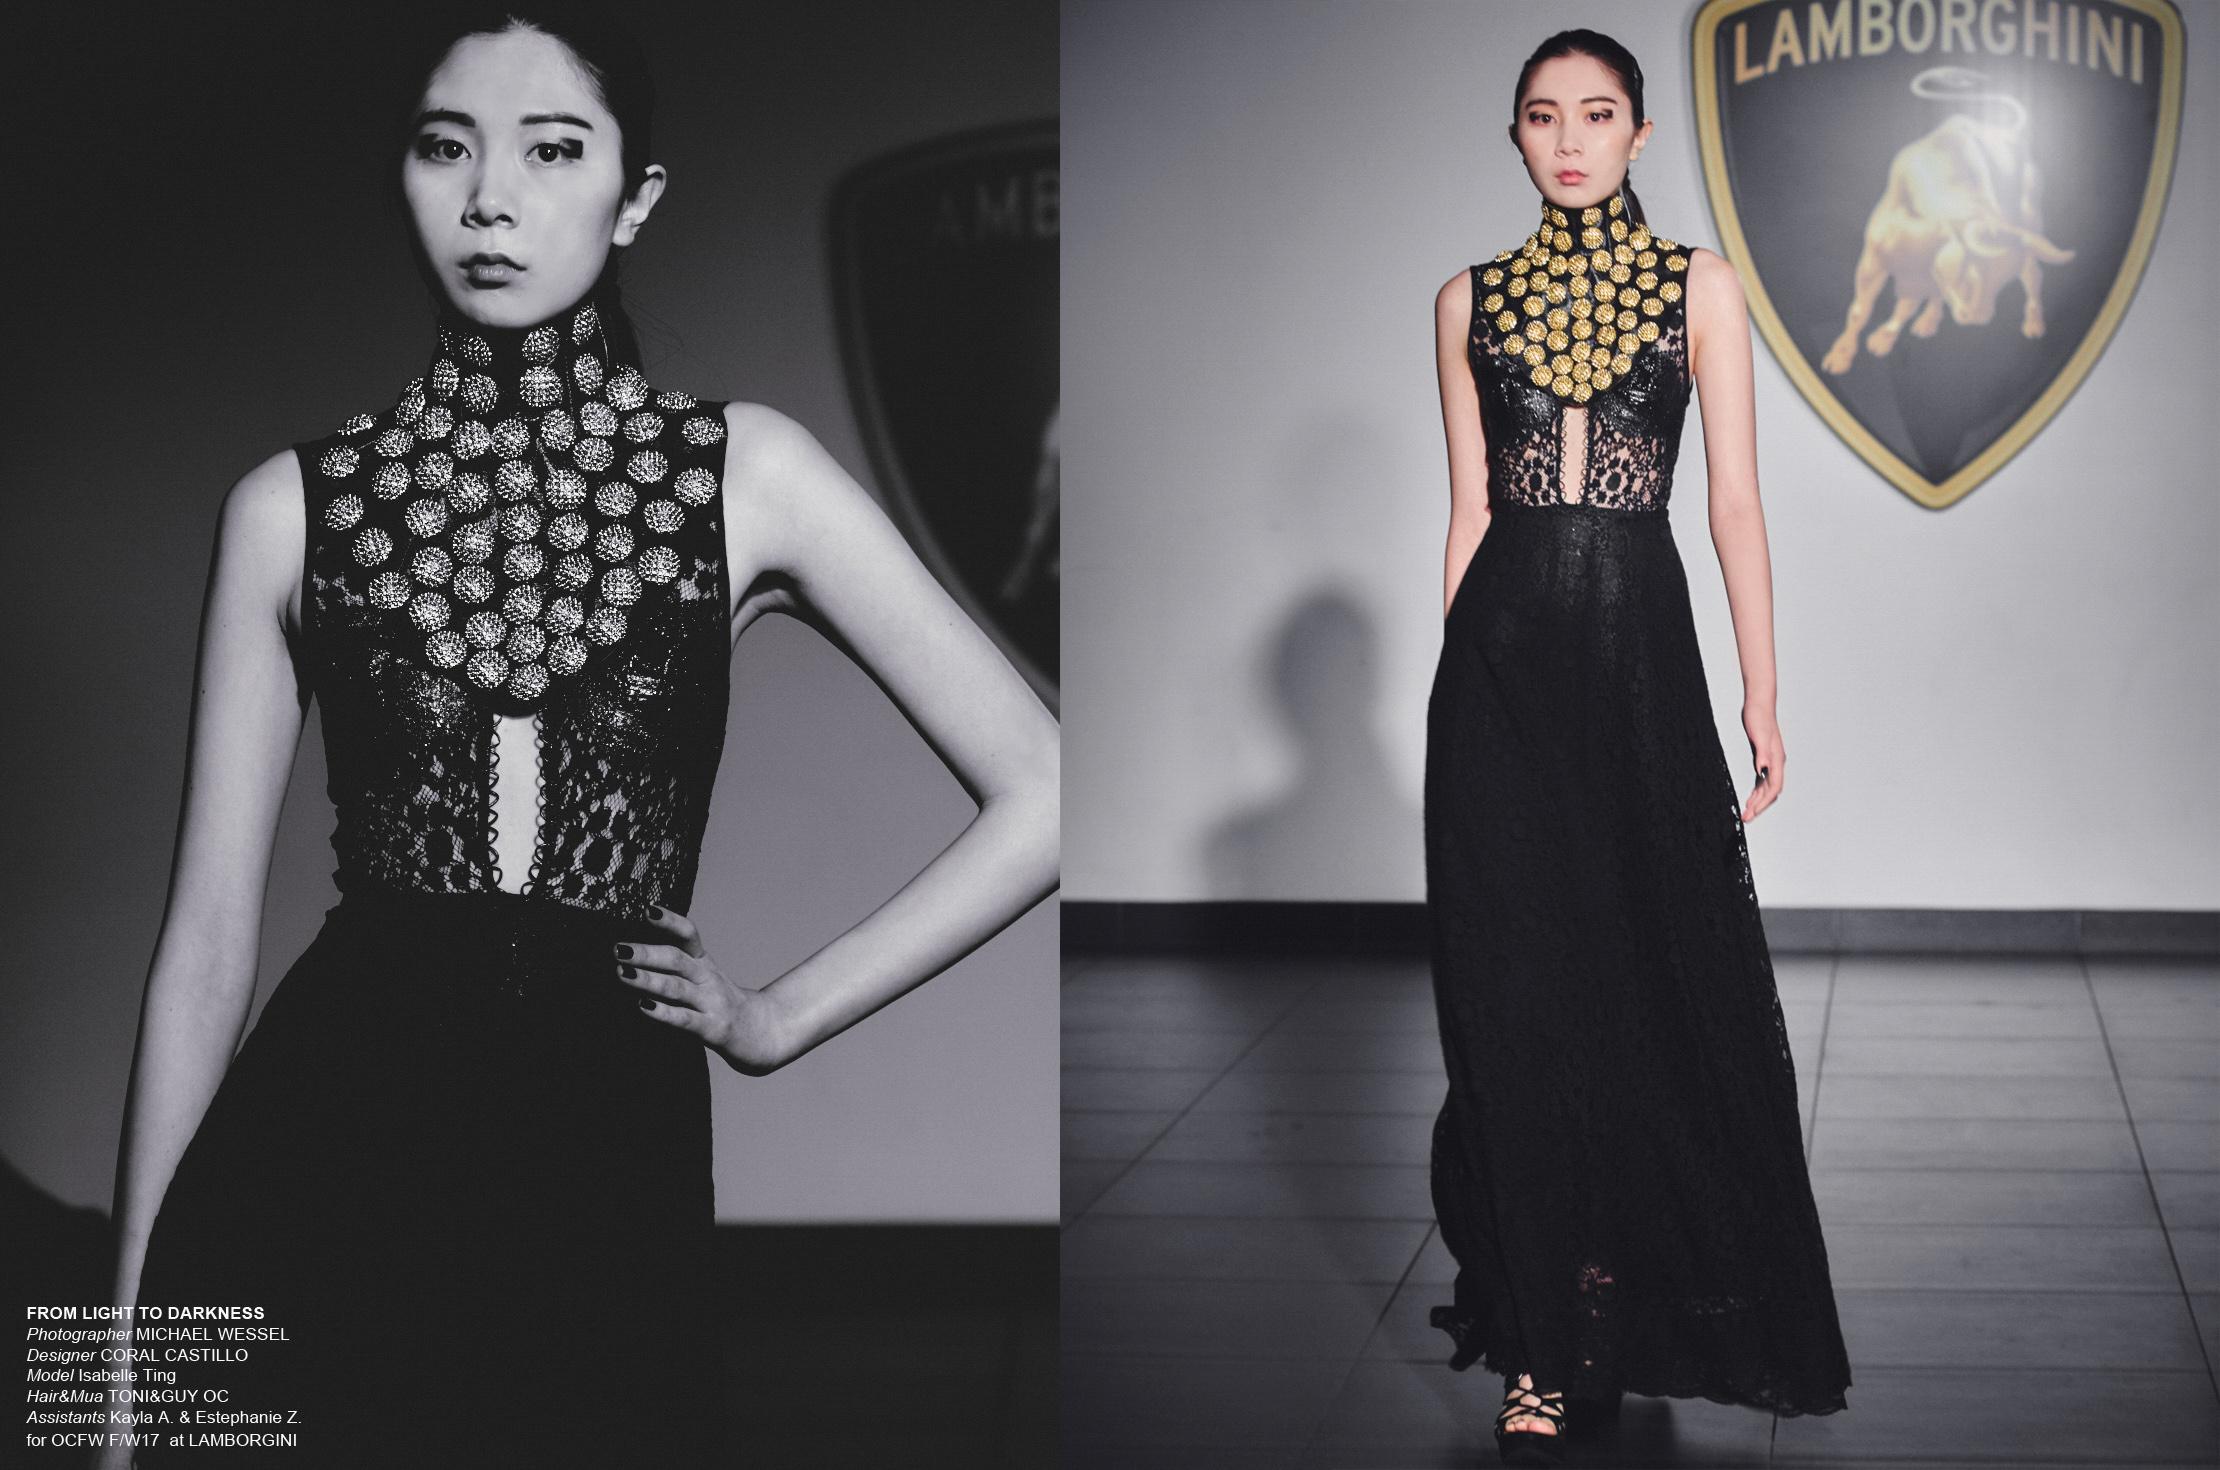 Coral Castillo - OC Fashion Week March 2017 - Photos by Michael Wessel & cREAtive Castle Studios (www.creativecastlestudios.com-Coral-Castillo and www.creativecastlestudios.com-michael-wessel)-2.jpg